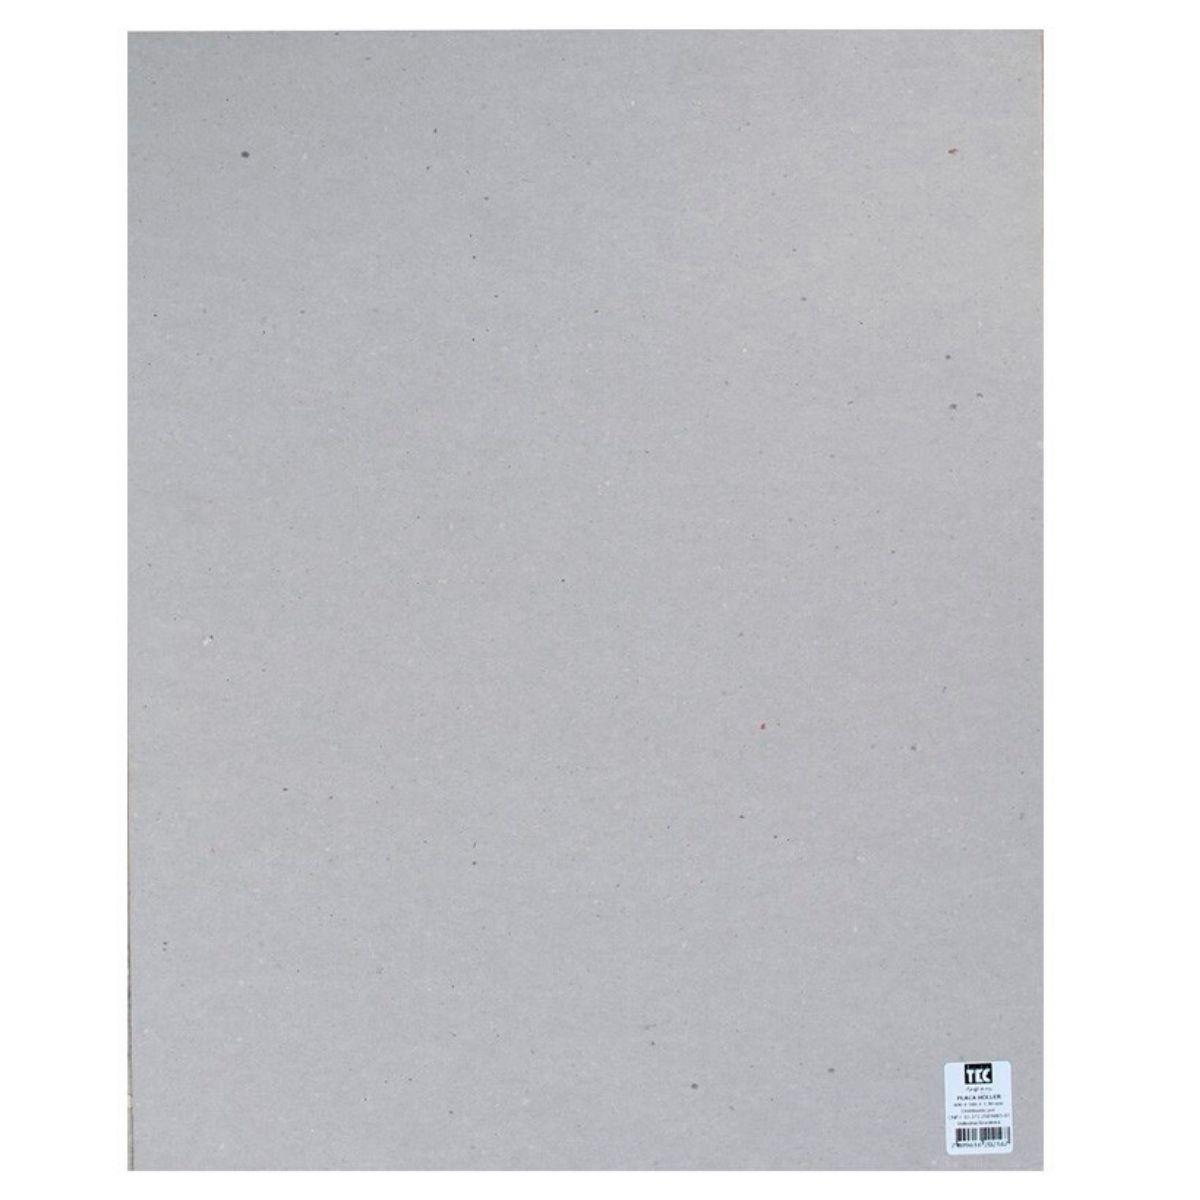 Papelão Cinza tipo Papel Holler 400 x 500 x 1,4mm Toke e Crie